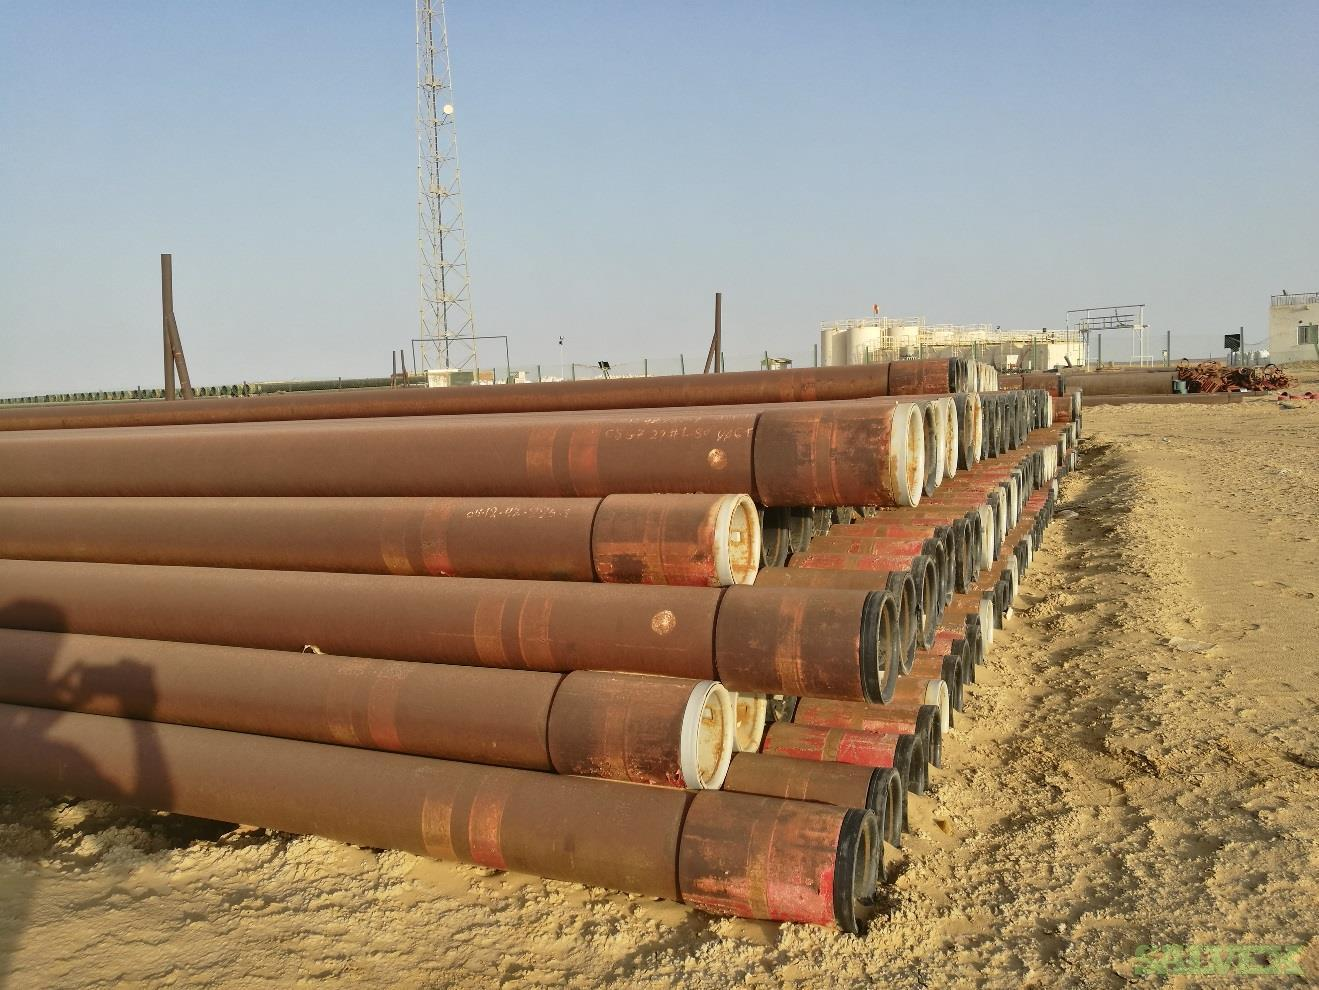 7 29# L80 VAGT R3 Surplus Casing (13,600 Feet / 179 Metric Tons)